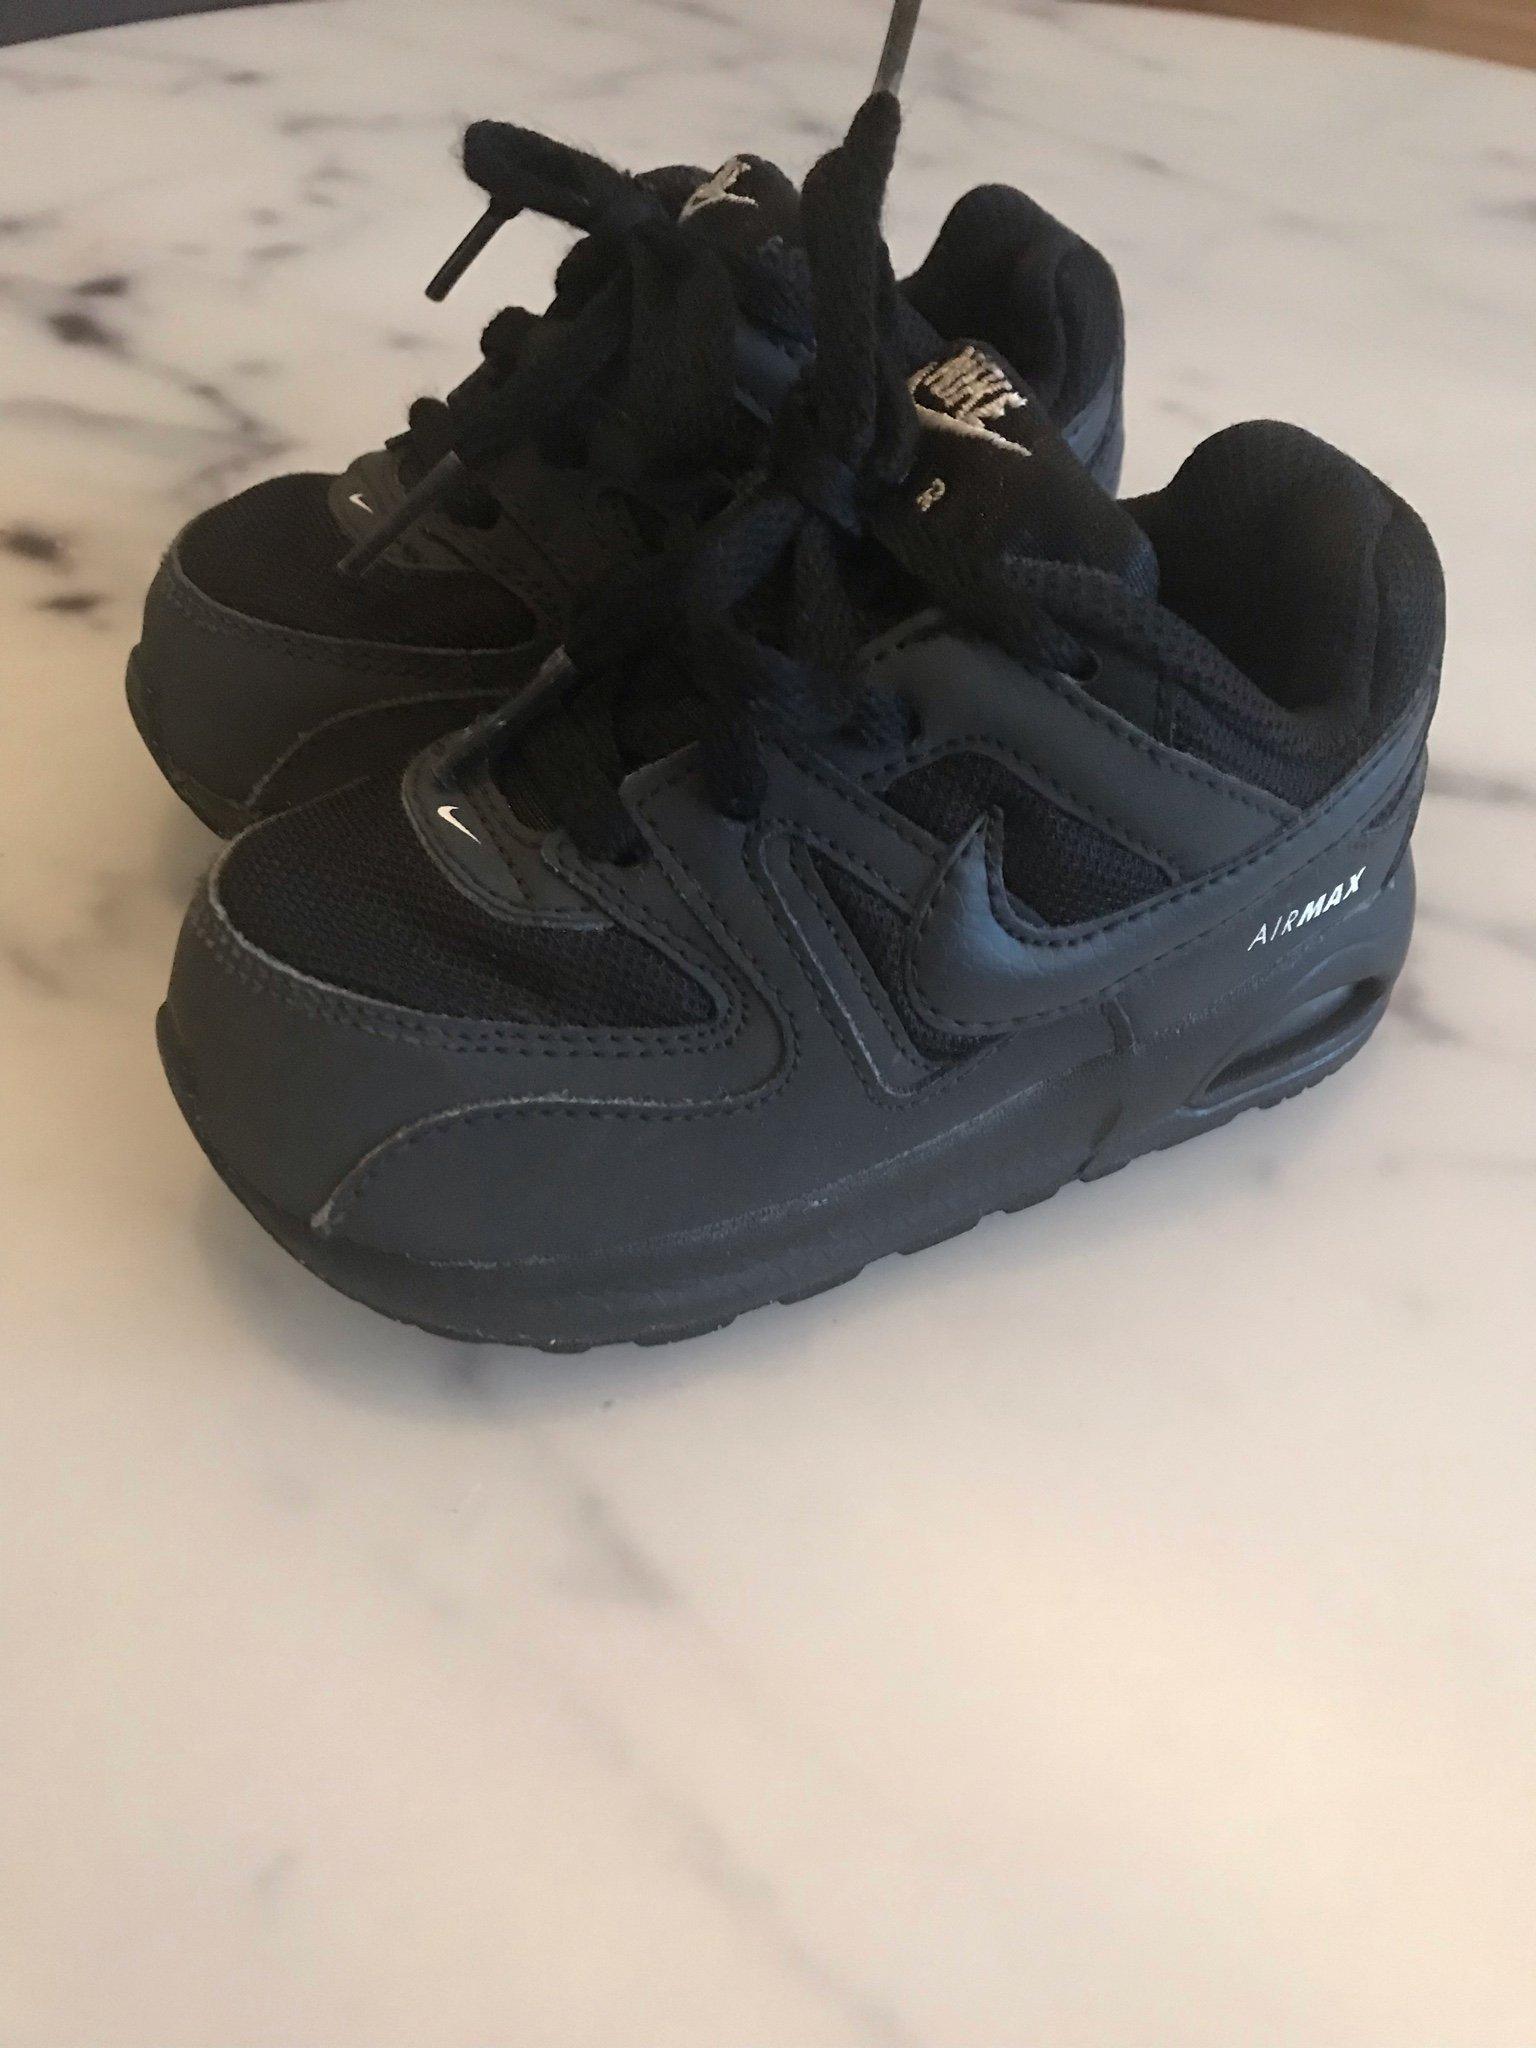 Tuffa svarta Nike Air Max sneakers, stl 23,5 (362325741) ᐈ